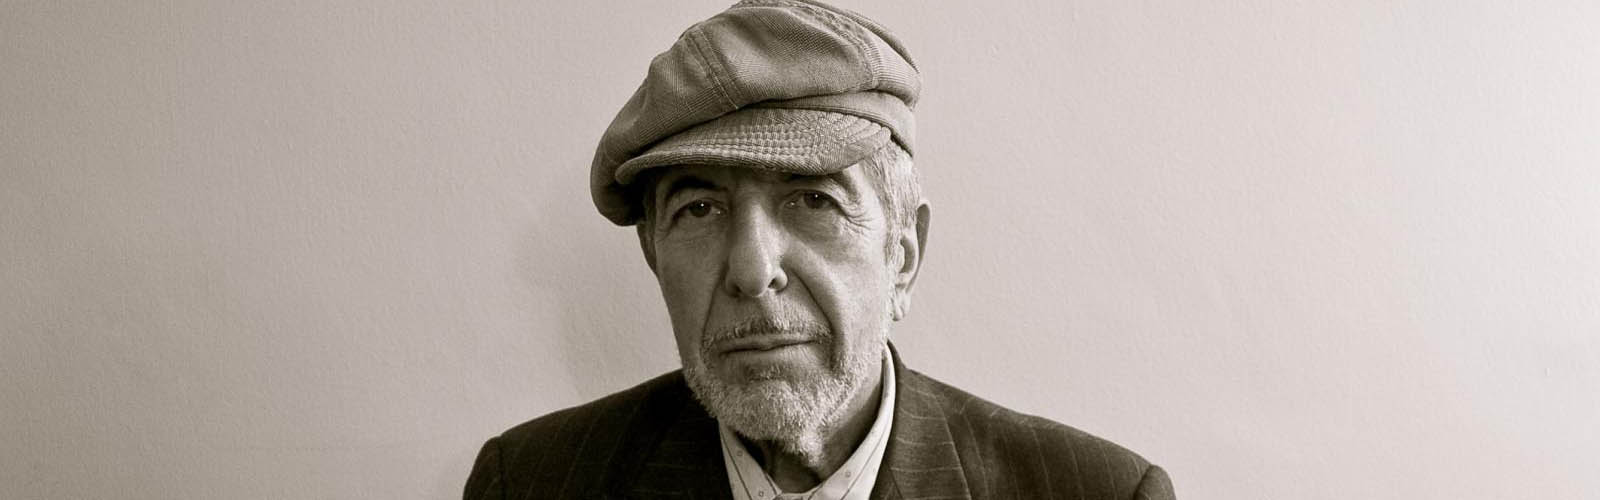 Leonard-Cohen-GI